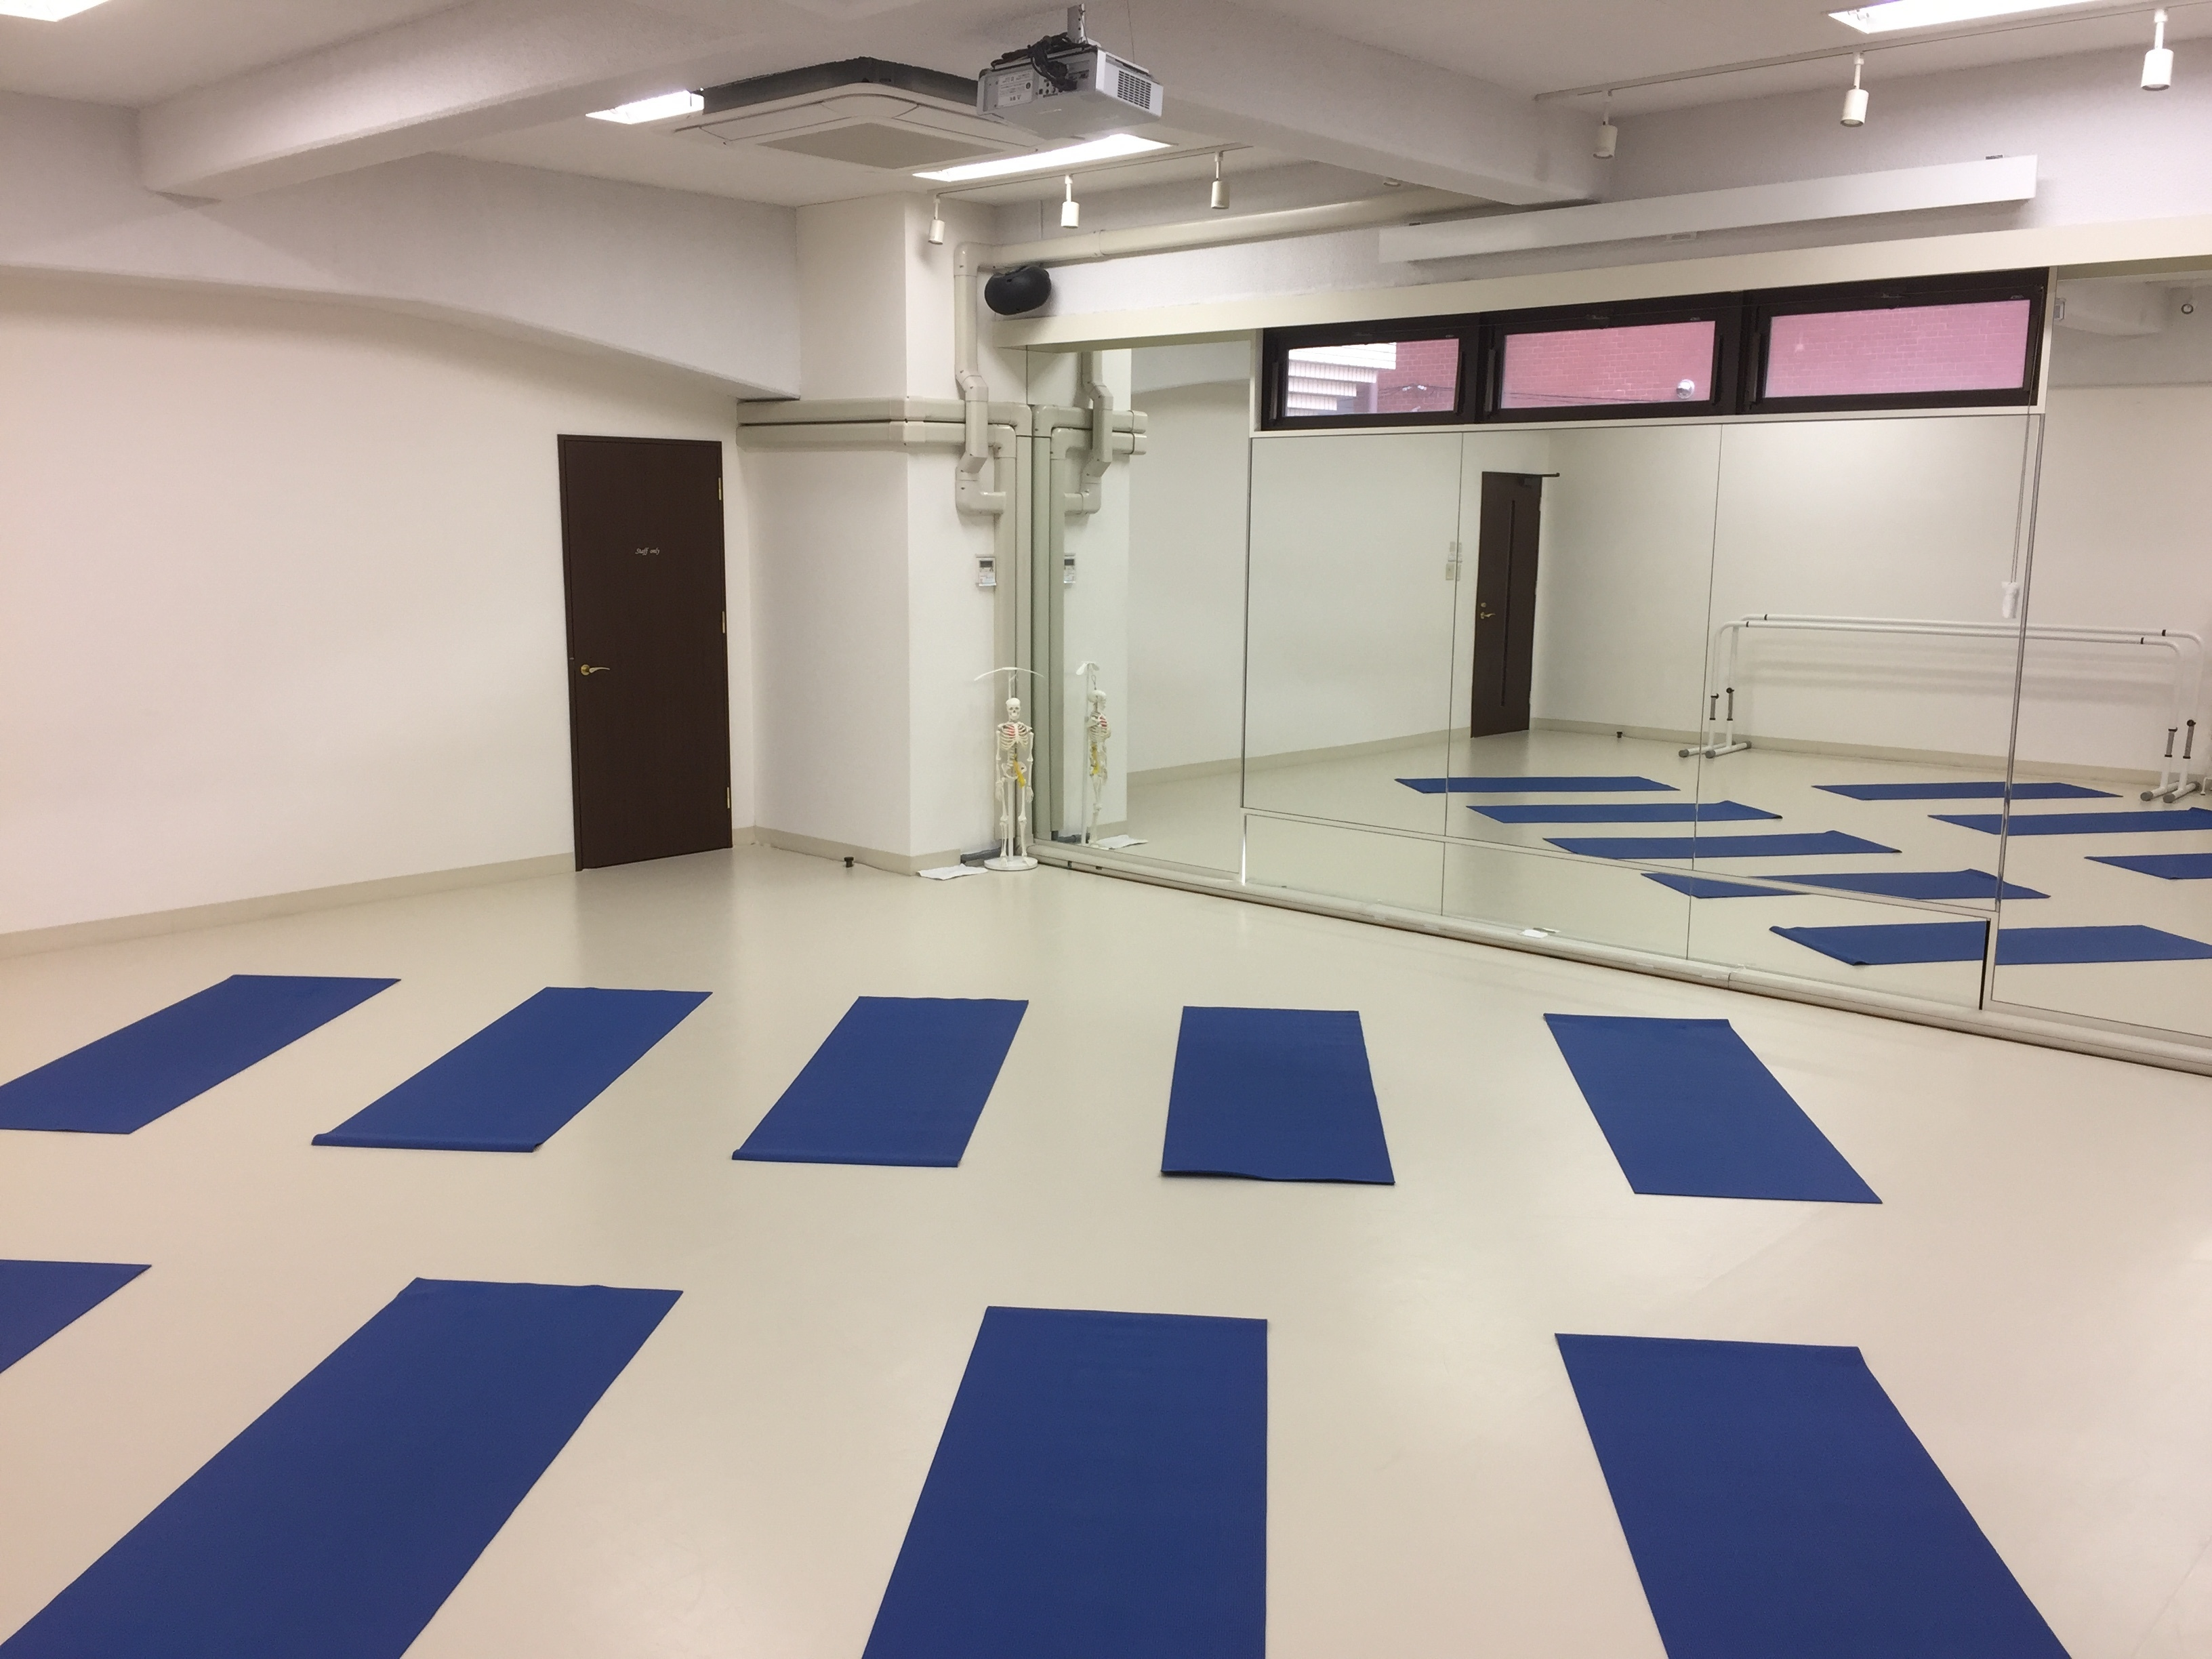 Ayumi Ballet アユミバレエの室内の写真